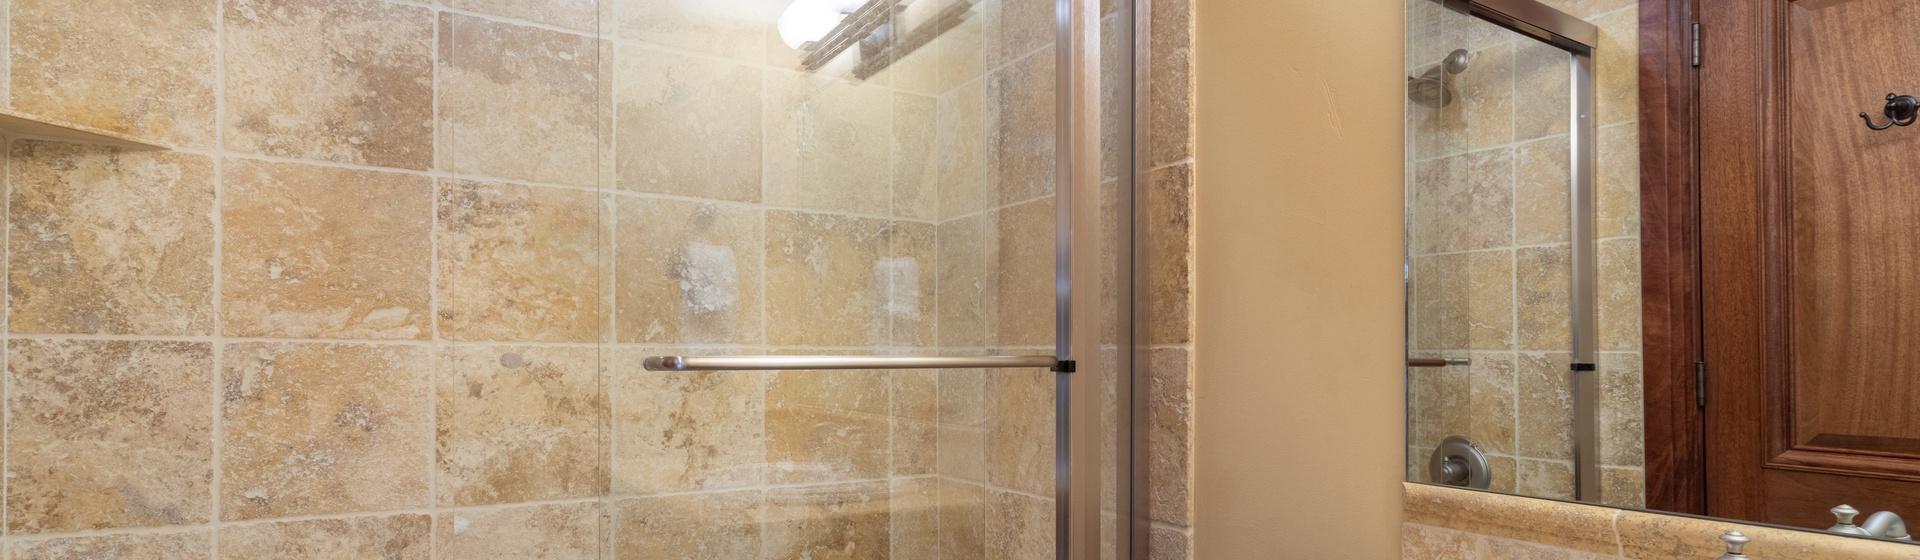 2.09-telluride-tres-casas-B-guest-bathroom-web.jpg